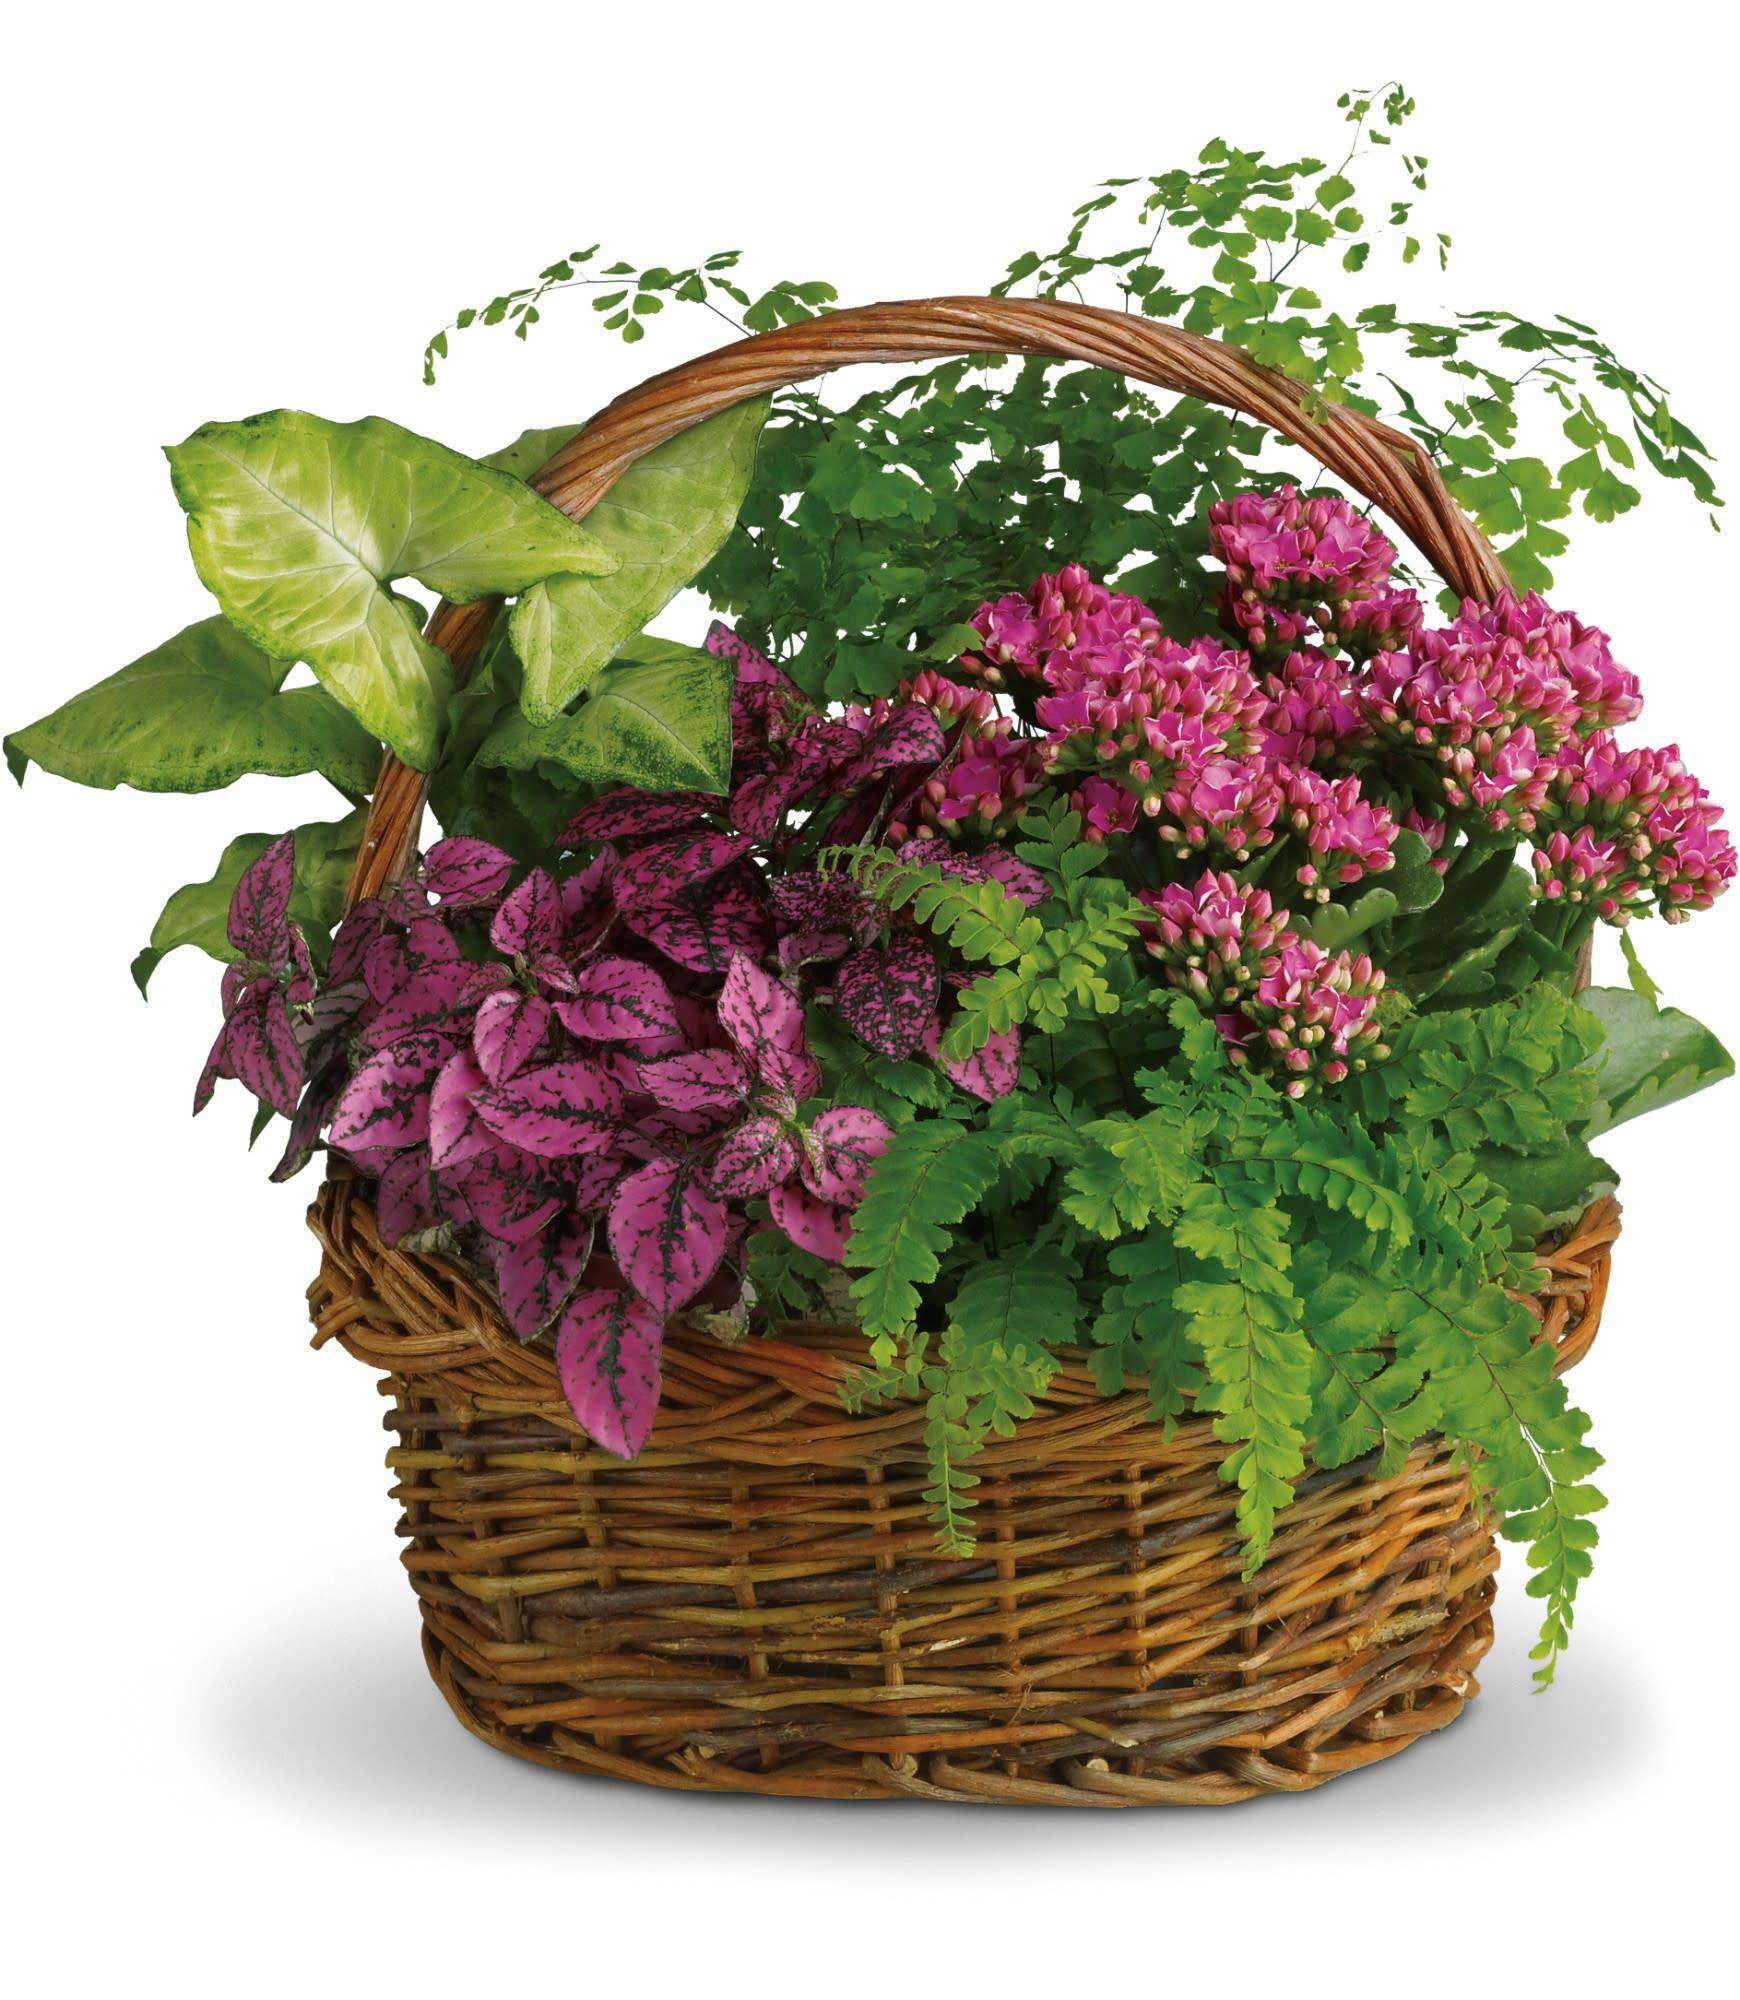 ba09cb897e Secret Garden Basket in Beeville, TX   Zimmer Floral and Nursery